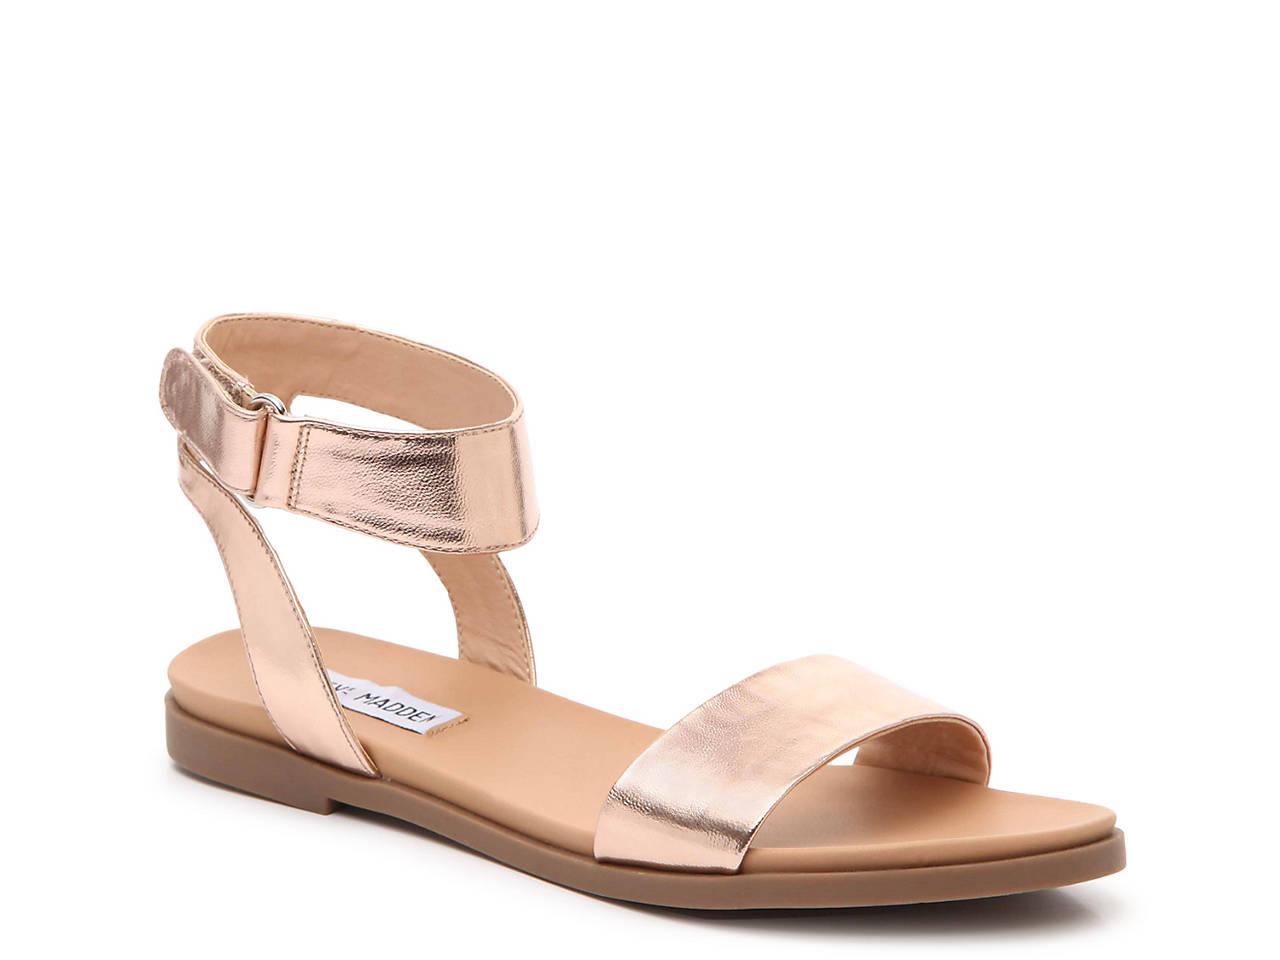 833f6f03a23 Steve Madden Meghan Flat Sandal Women s Shoes